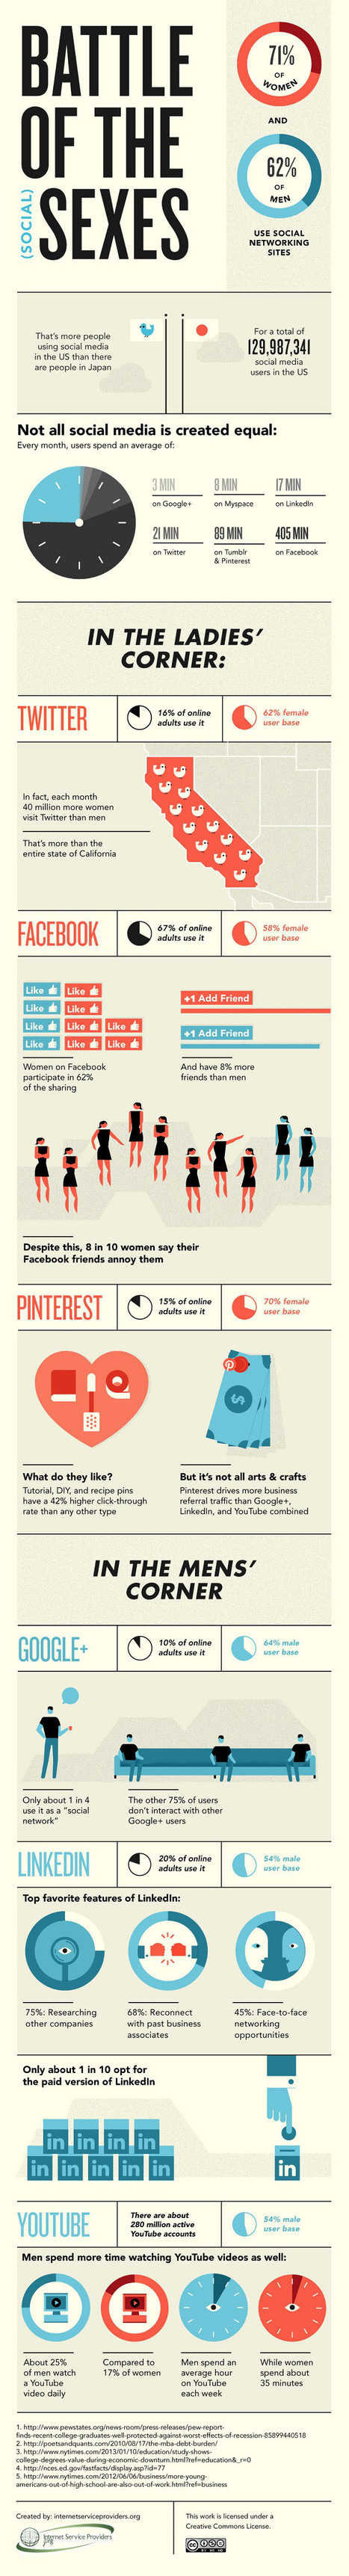 Battle of the Sexes: Men & Women Use Social Media Differently | Social Media, Digital Marketing | Scoop.it